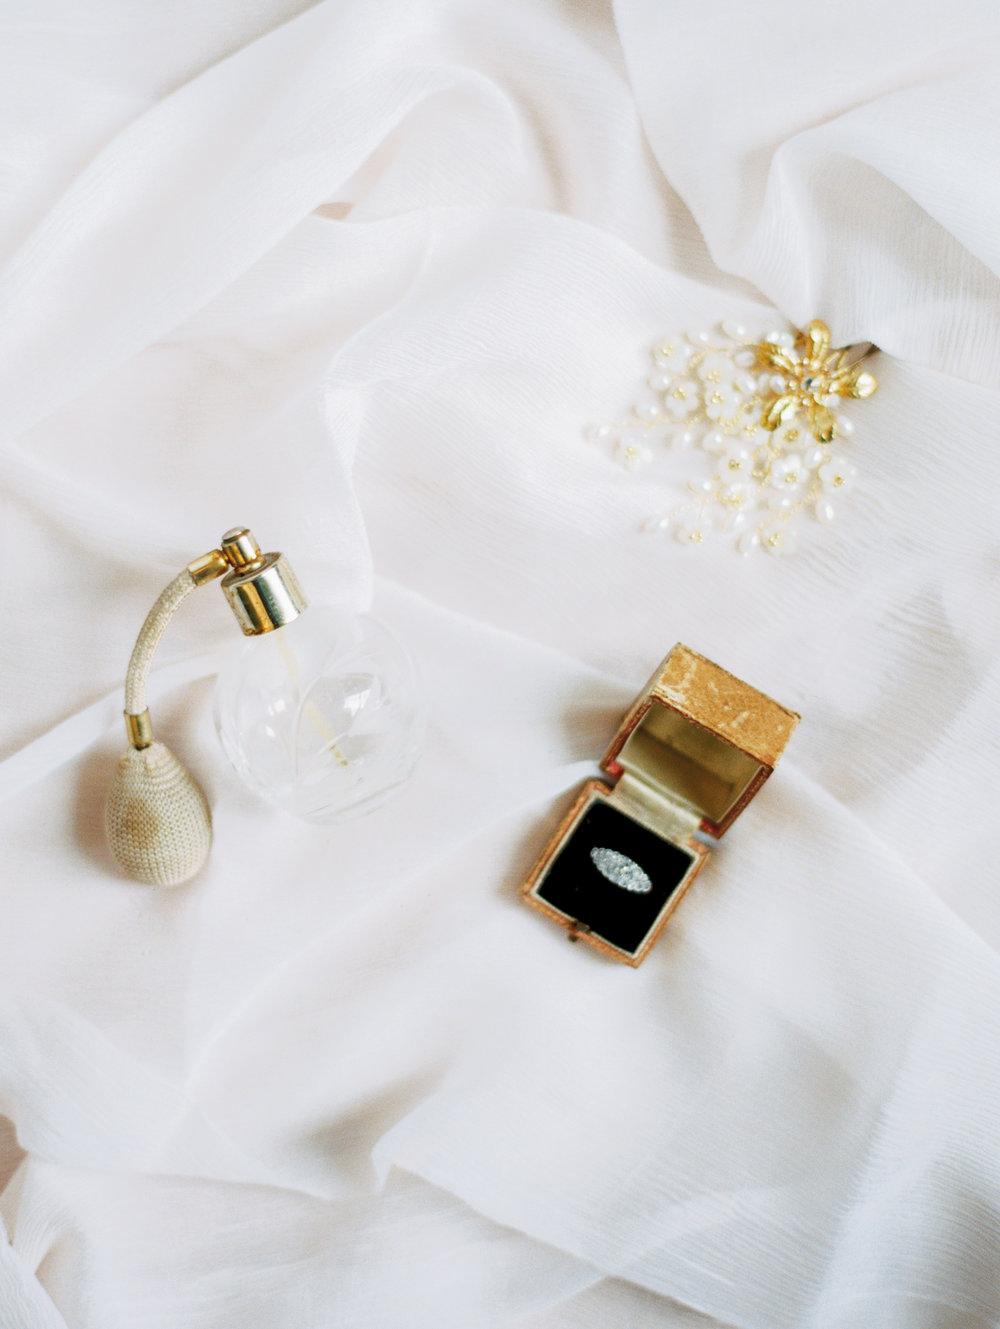 The Timeless Stylist-Antique Perfume Bottle.jpg